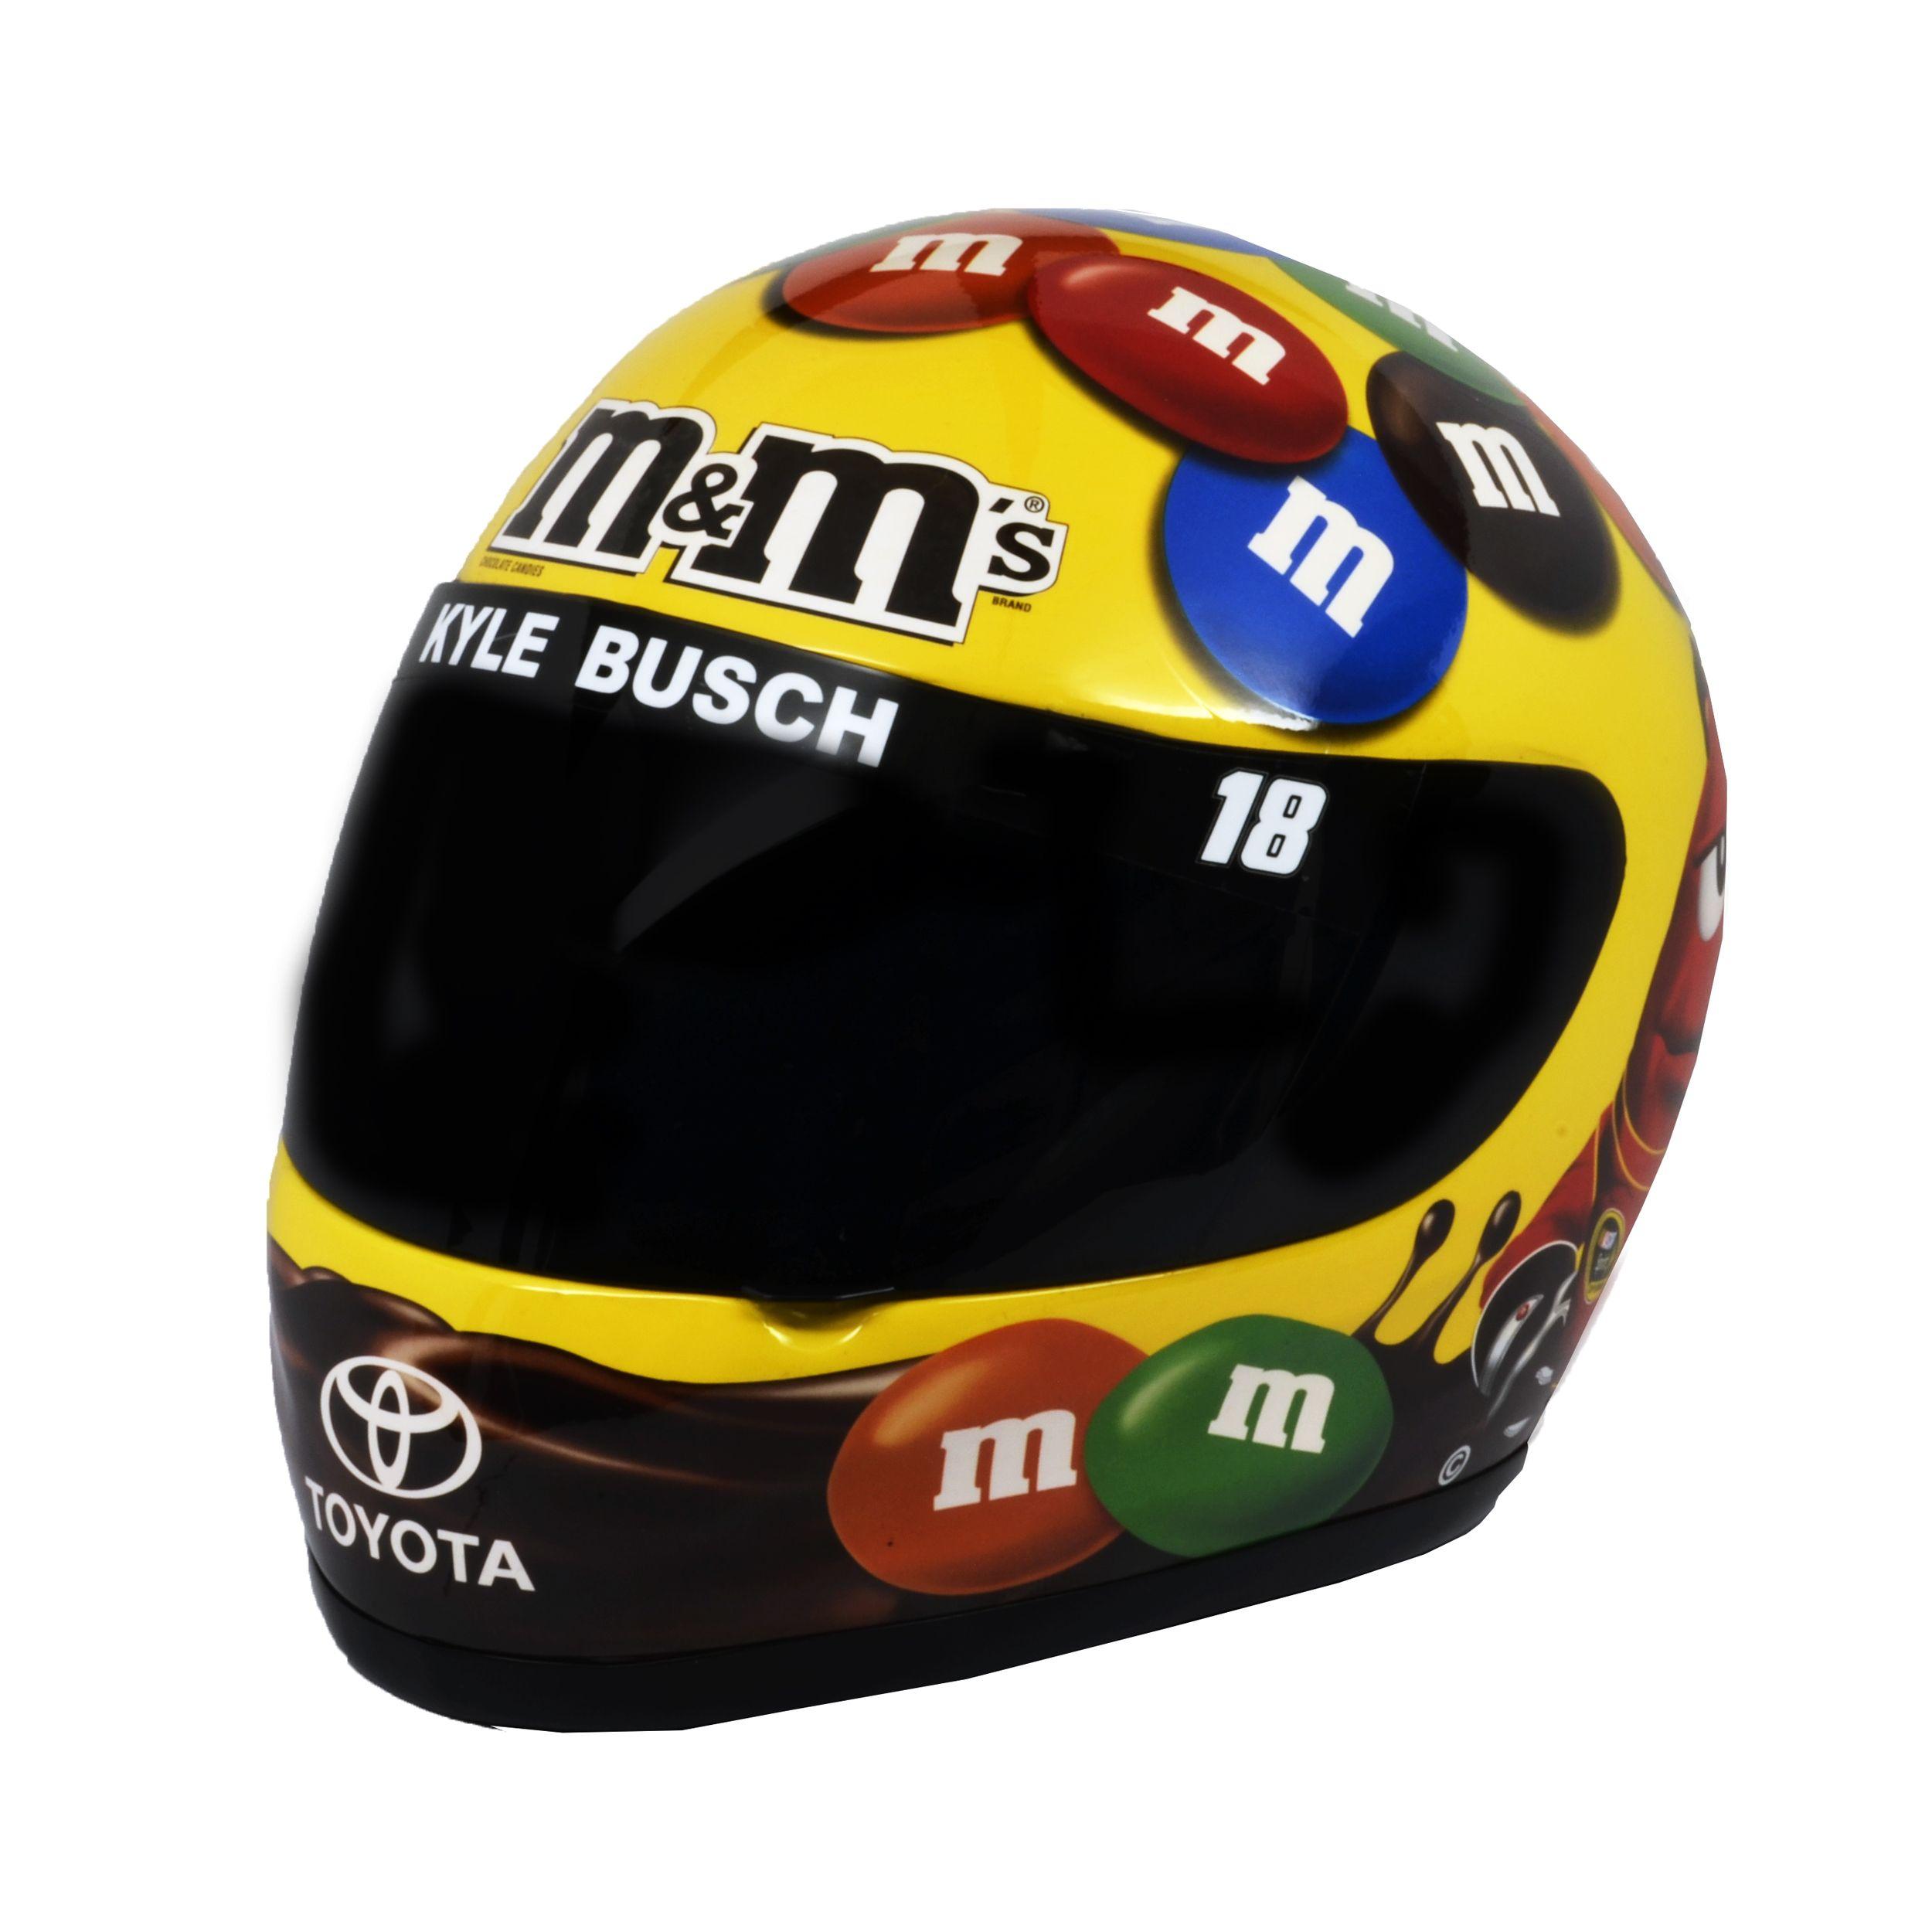 Penske Near Me >> Kyle Busch M's Driver Helmet | Nascar helmet, Helmet, Kyle ...